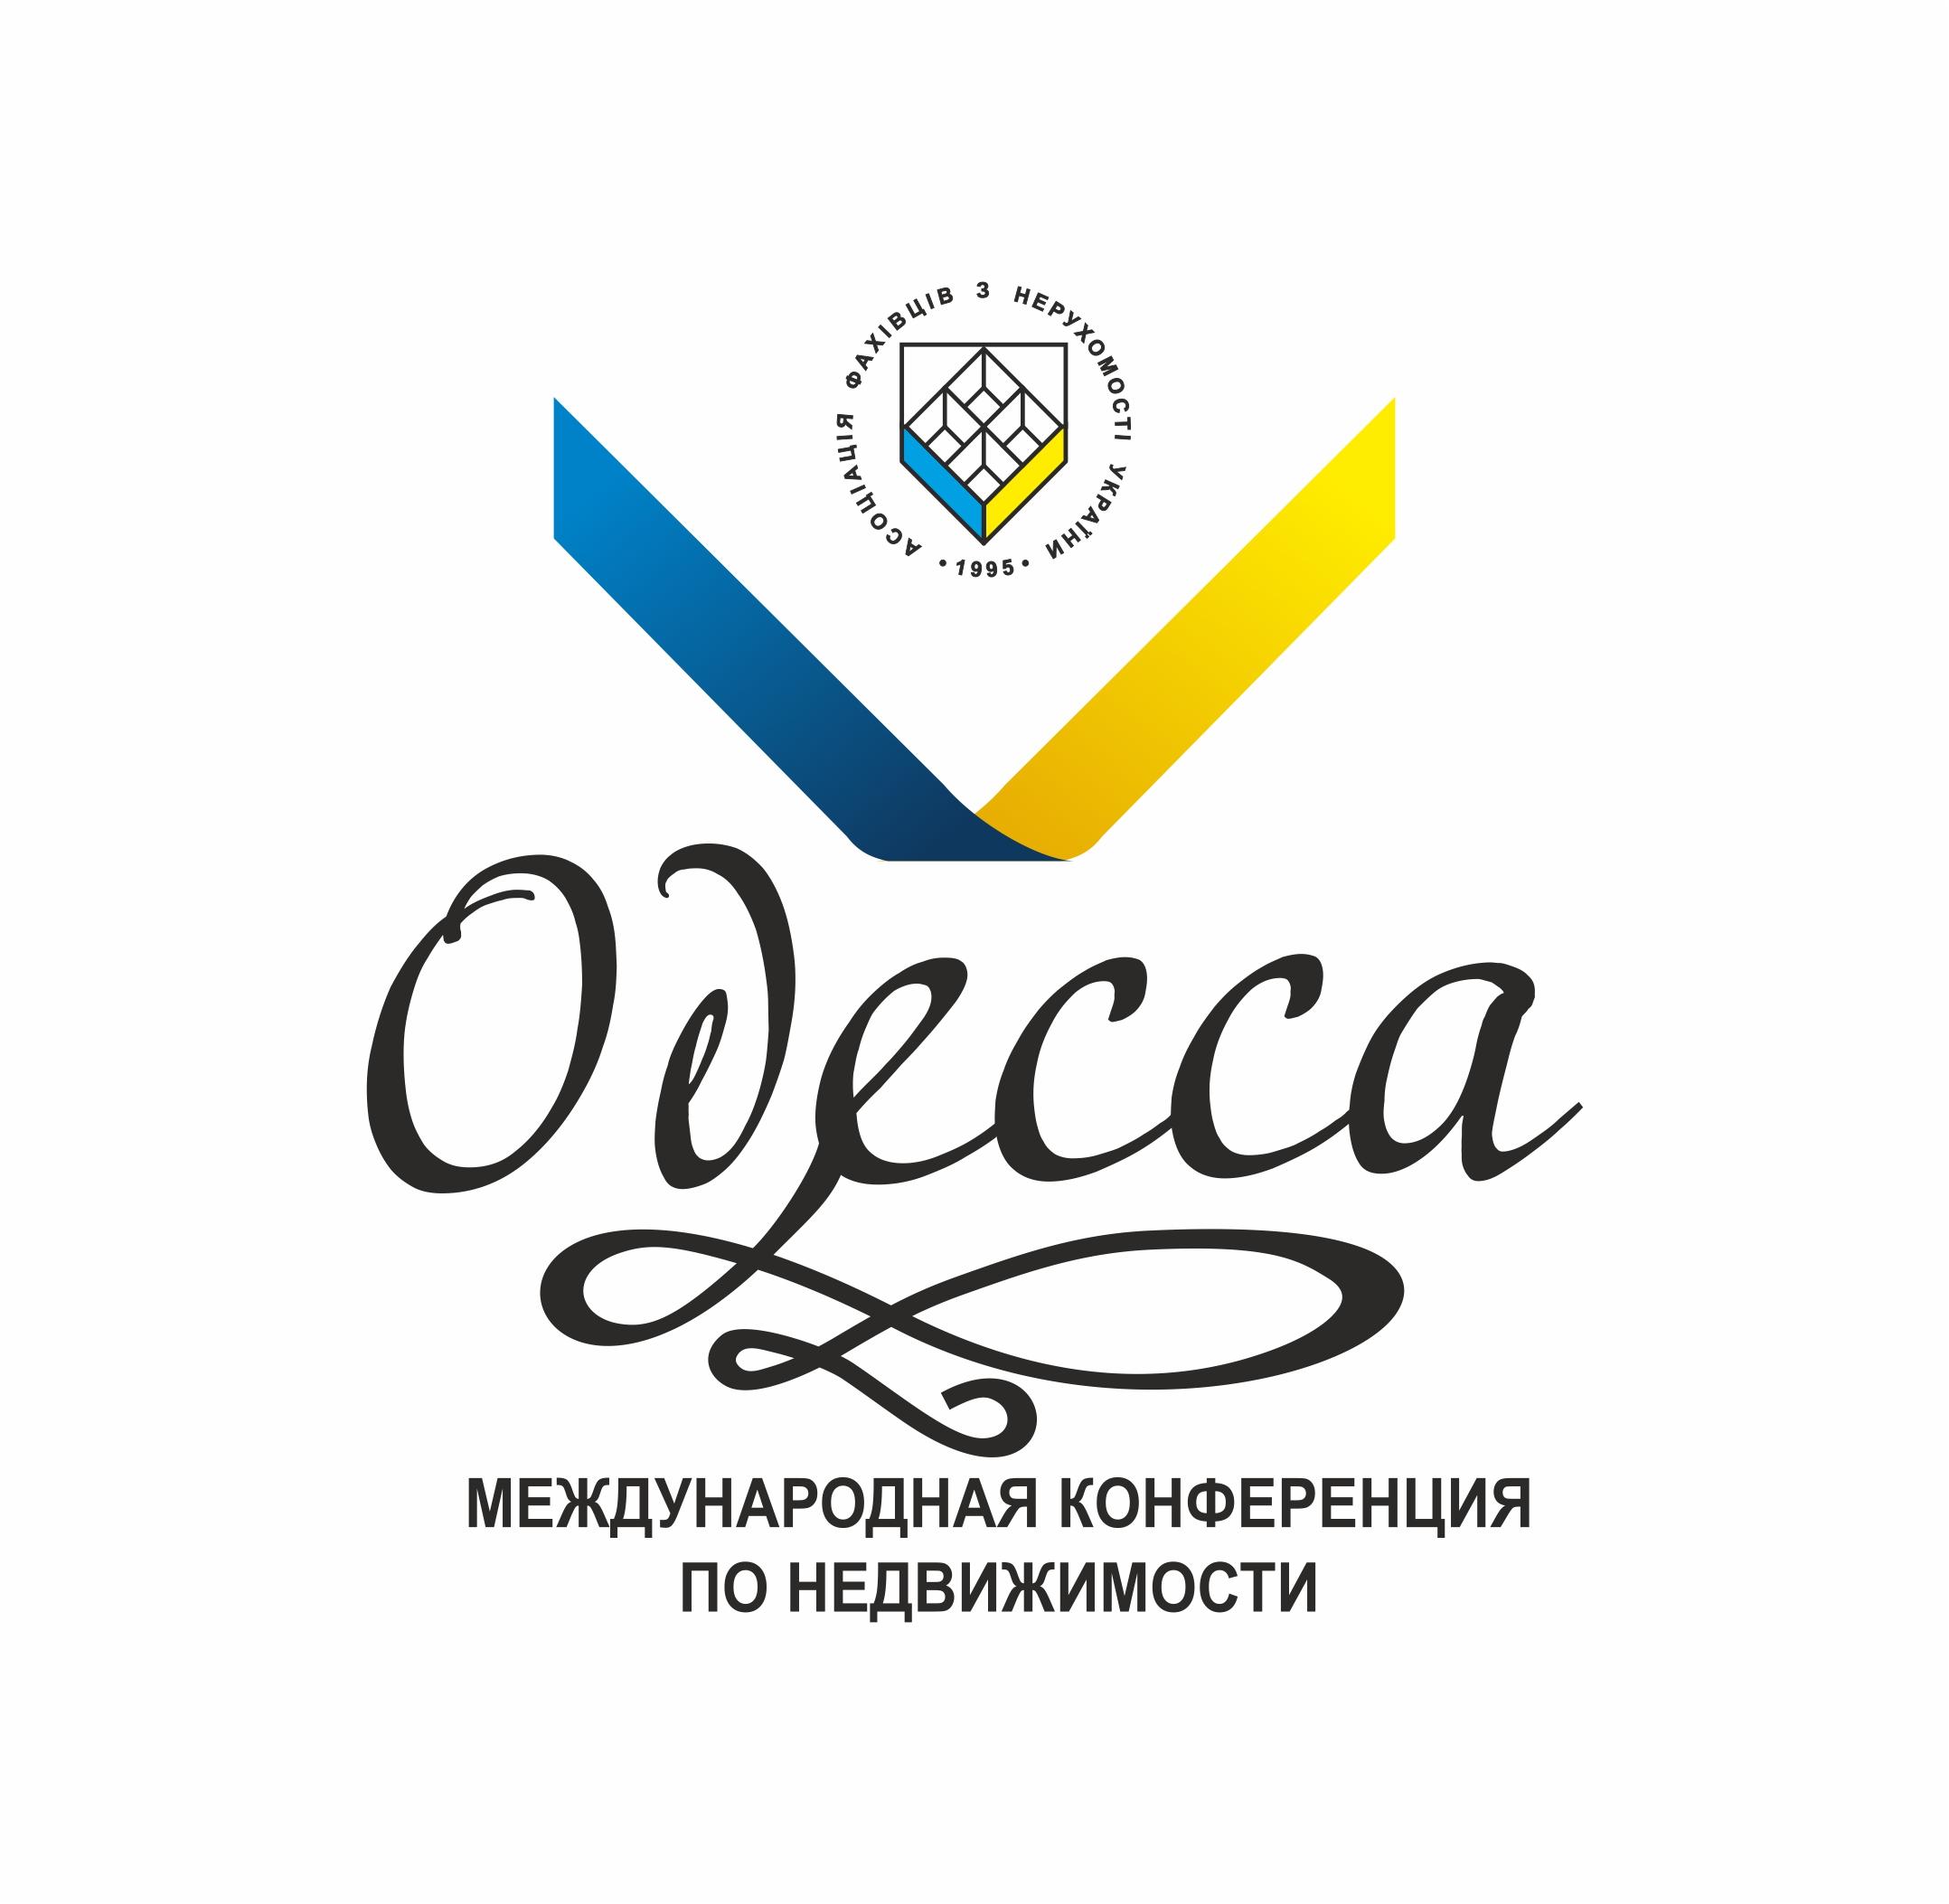 logo_Odessa.jpg